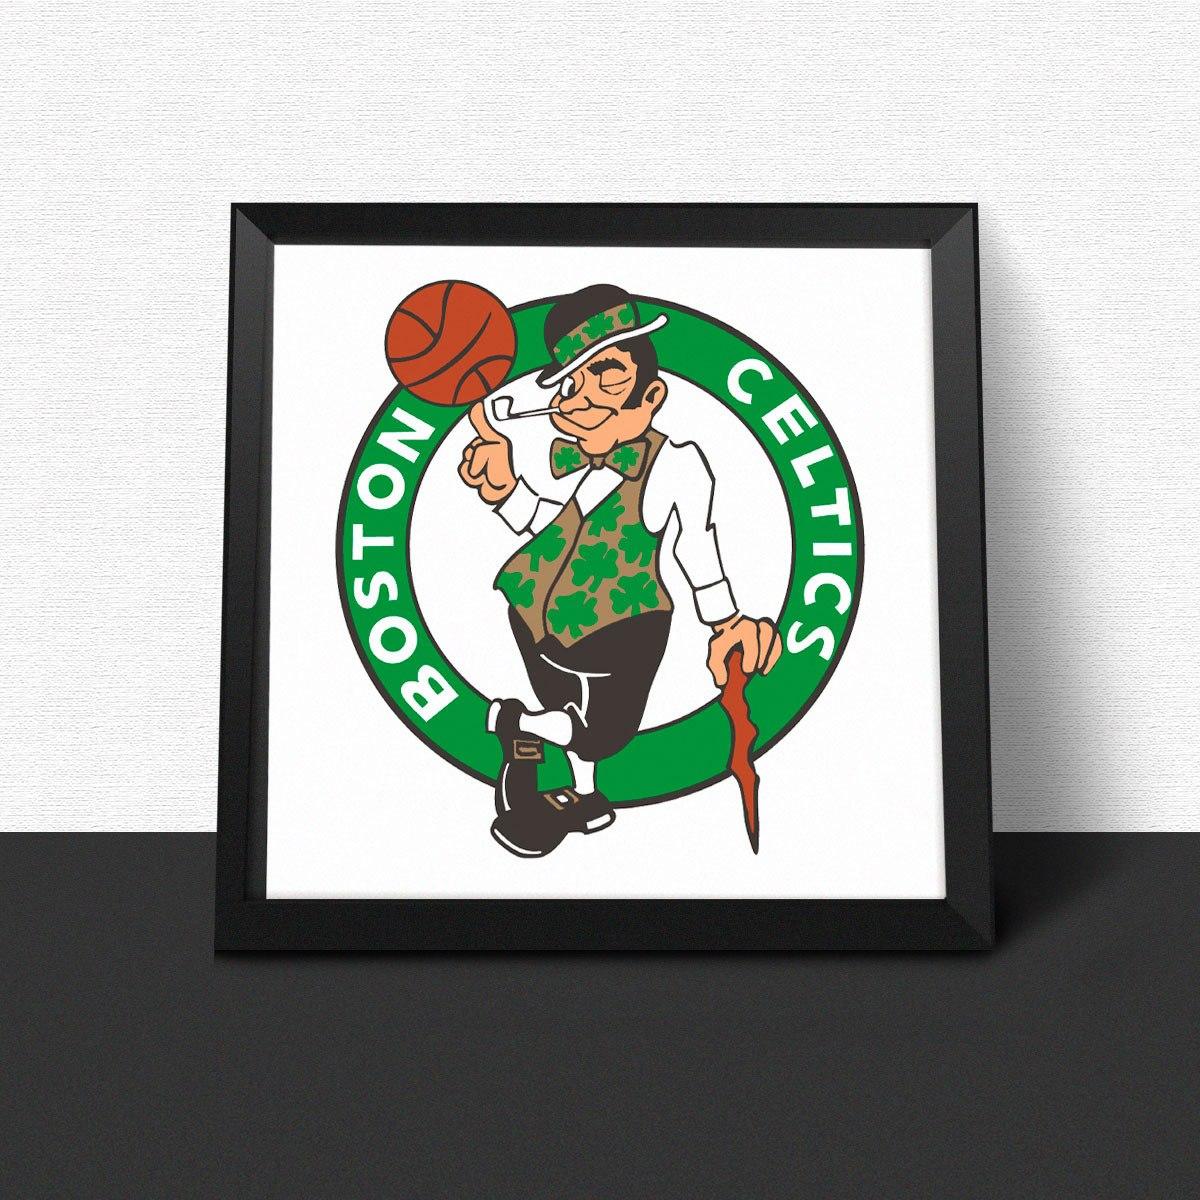 bcdf2f8c2 quadro decorativo basquete boston celtics nba. Carregando zoom.